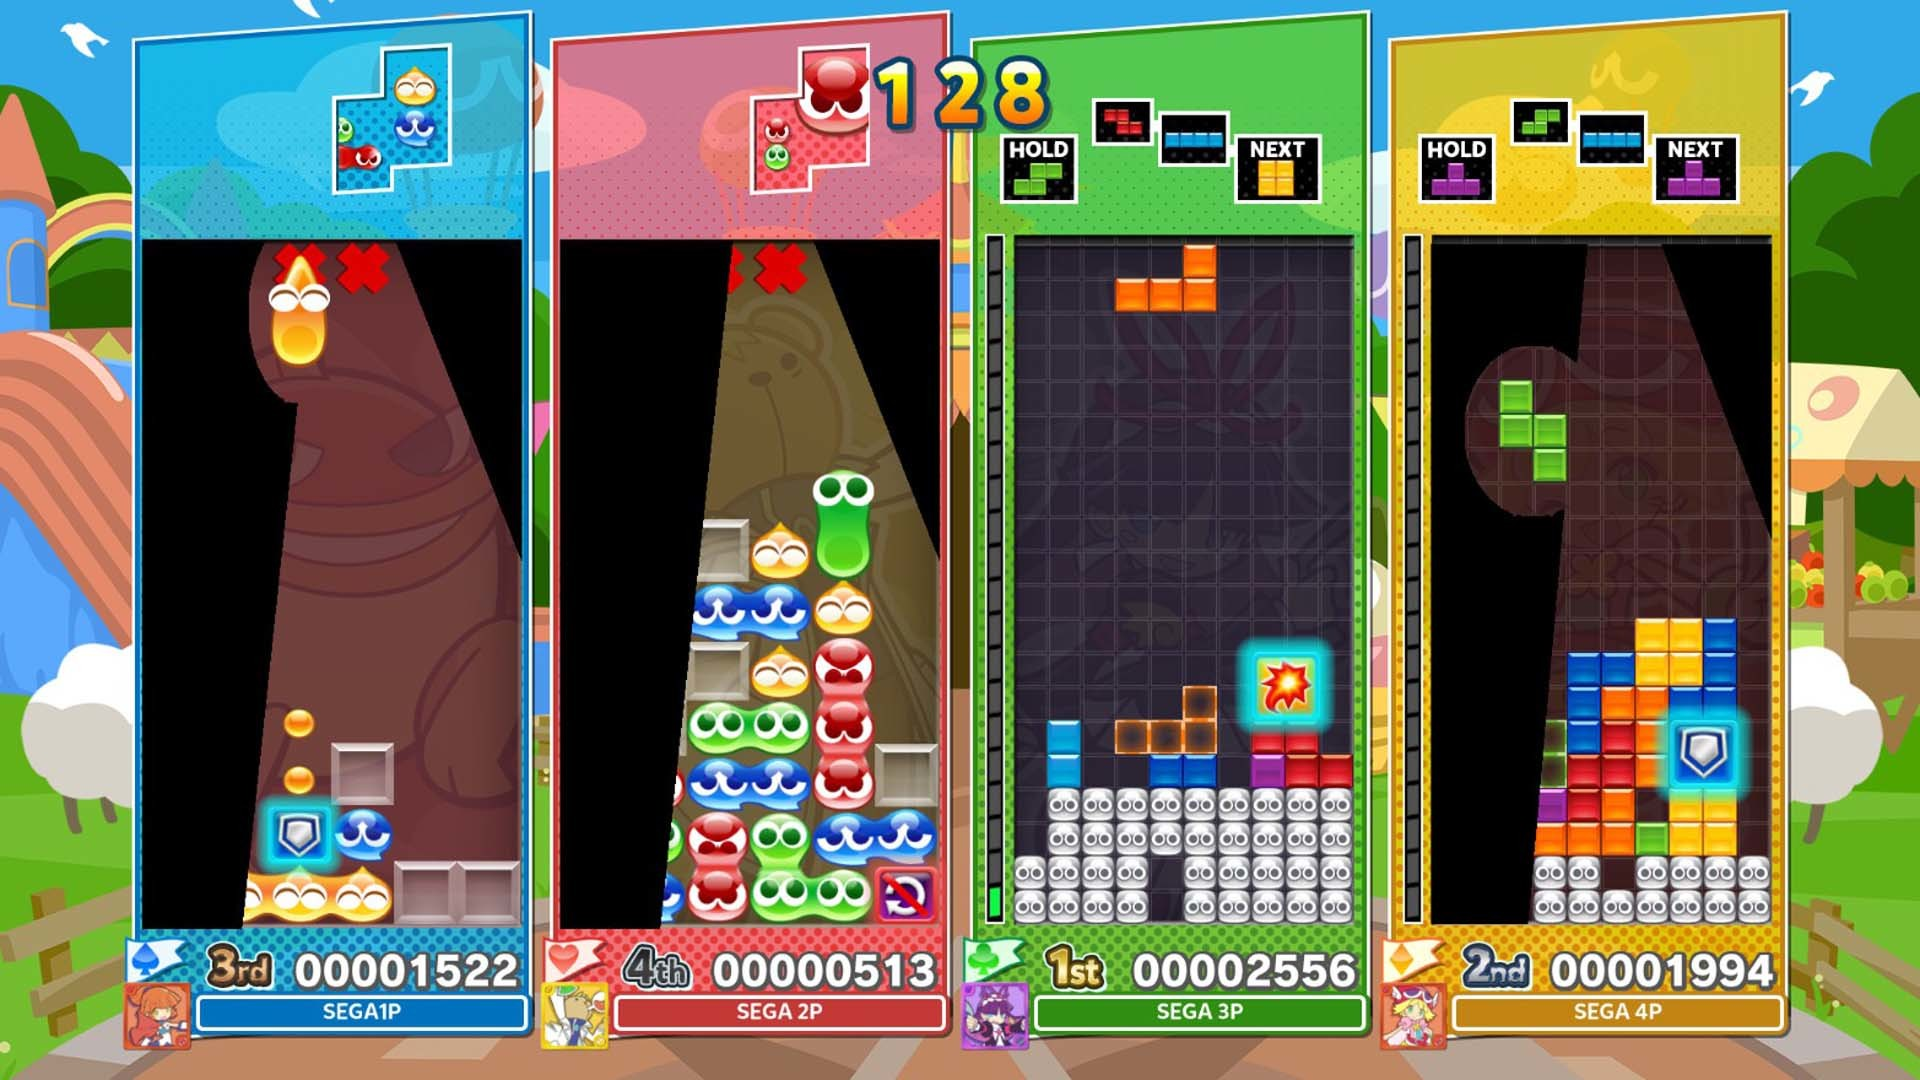 Puyo Puyo Tetris 2 Free Download